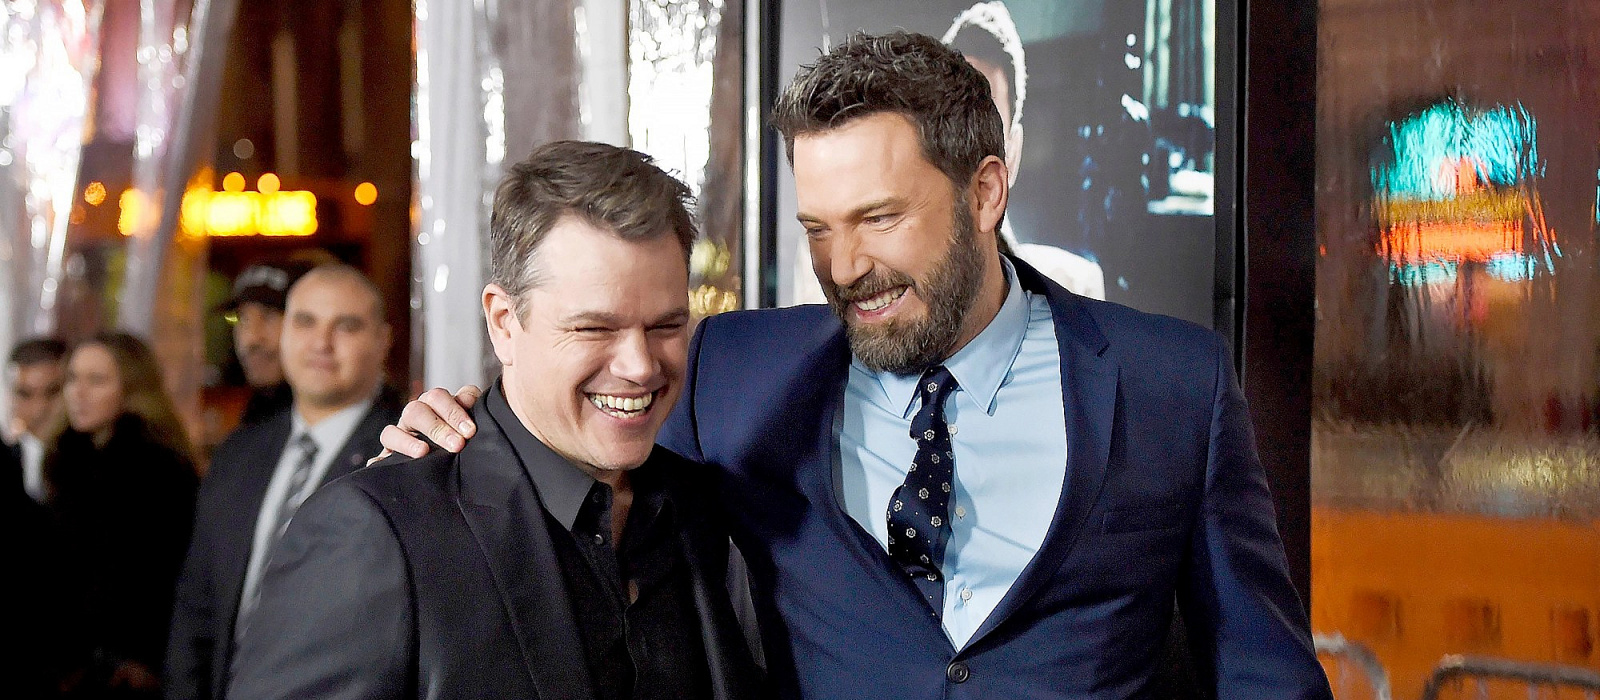 """Das wäre unser erster Kuss auf der Leinwand"": Matt Damon könnte Ben Affleck in ""The Final Duel"" küssen"